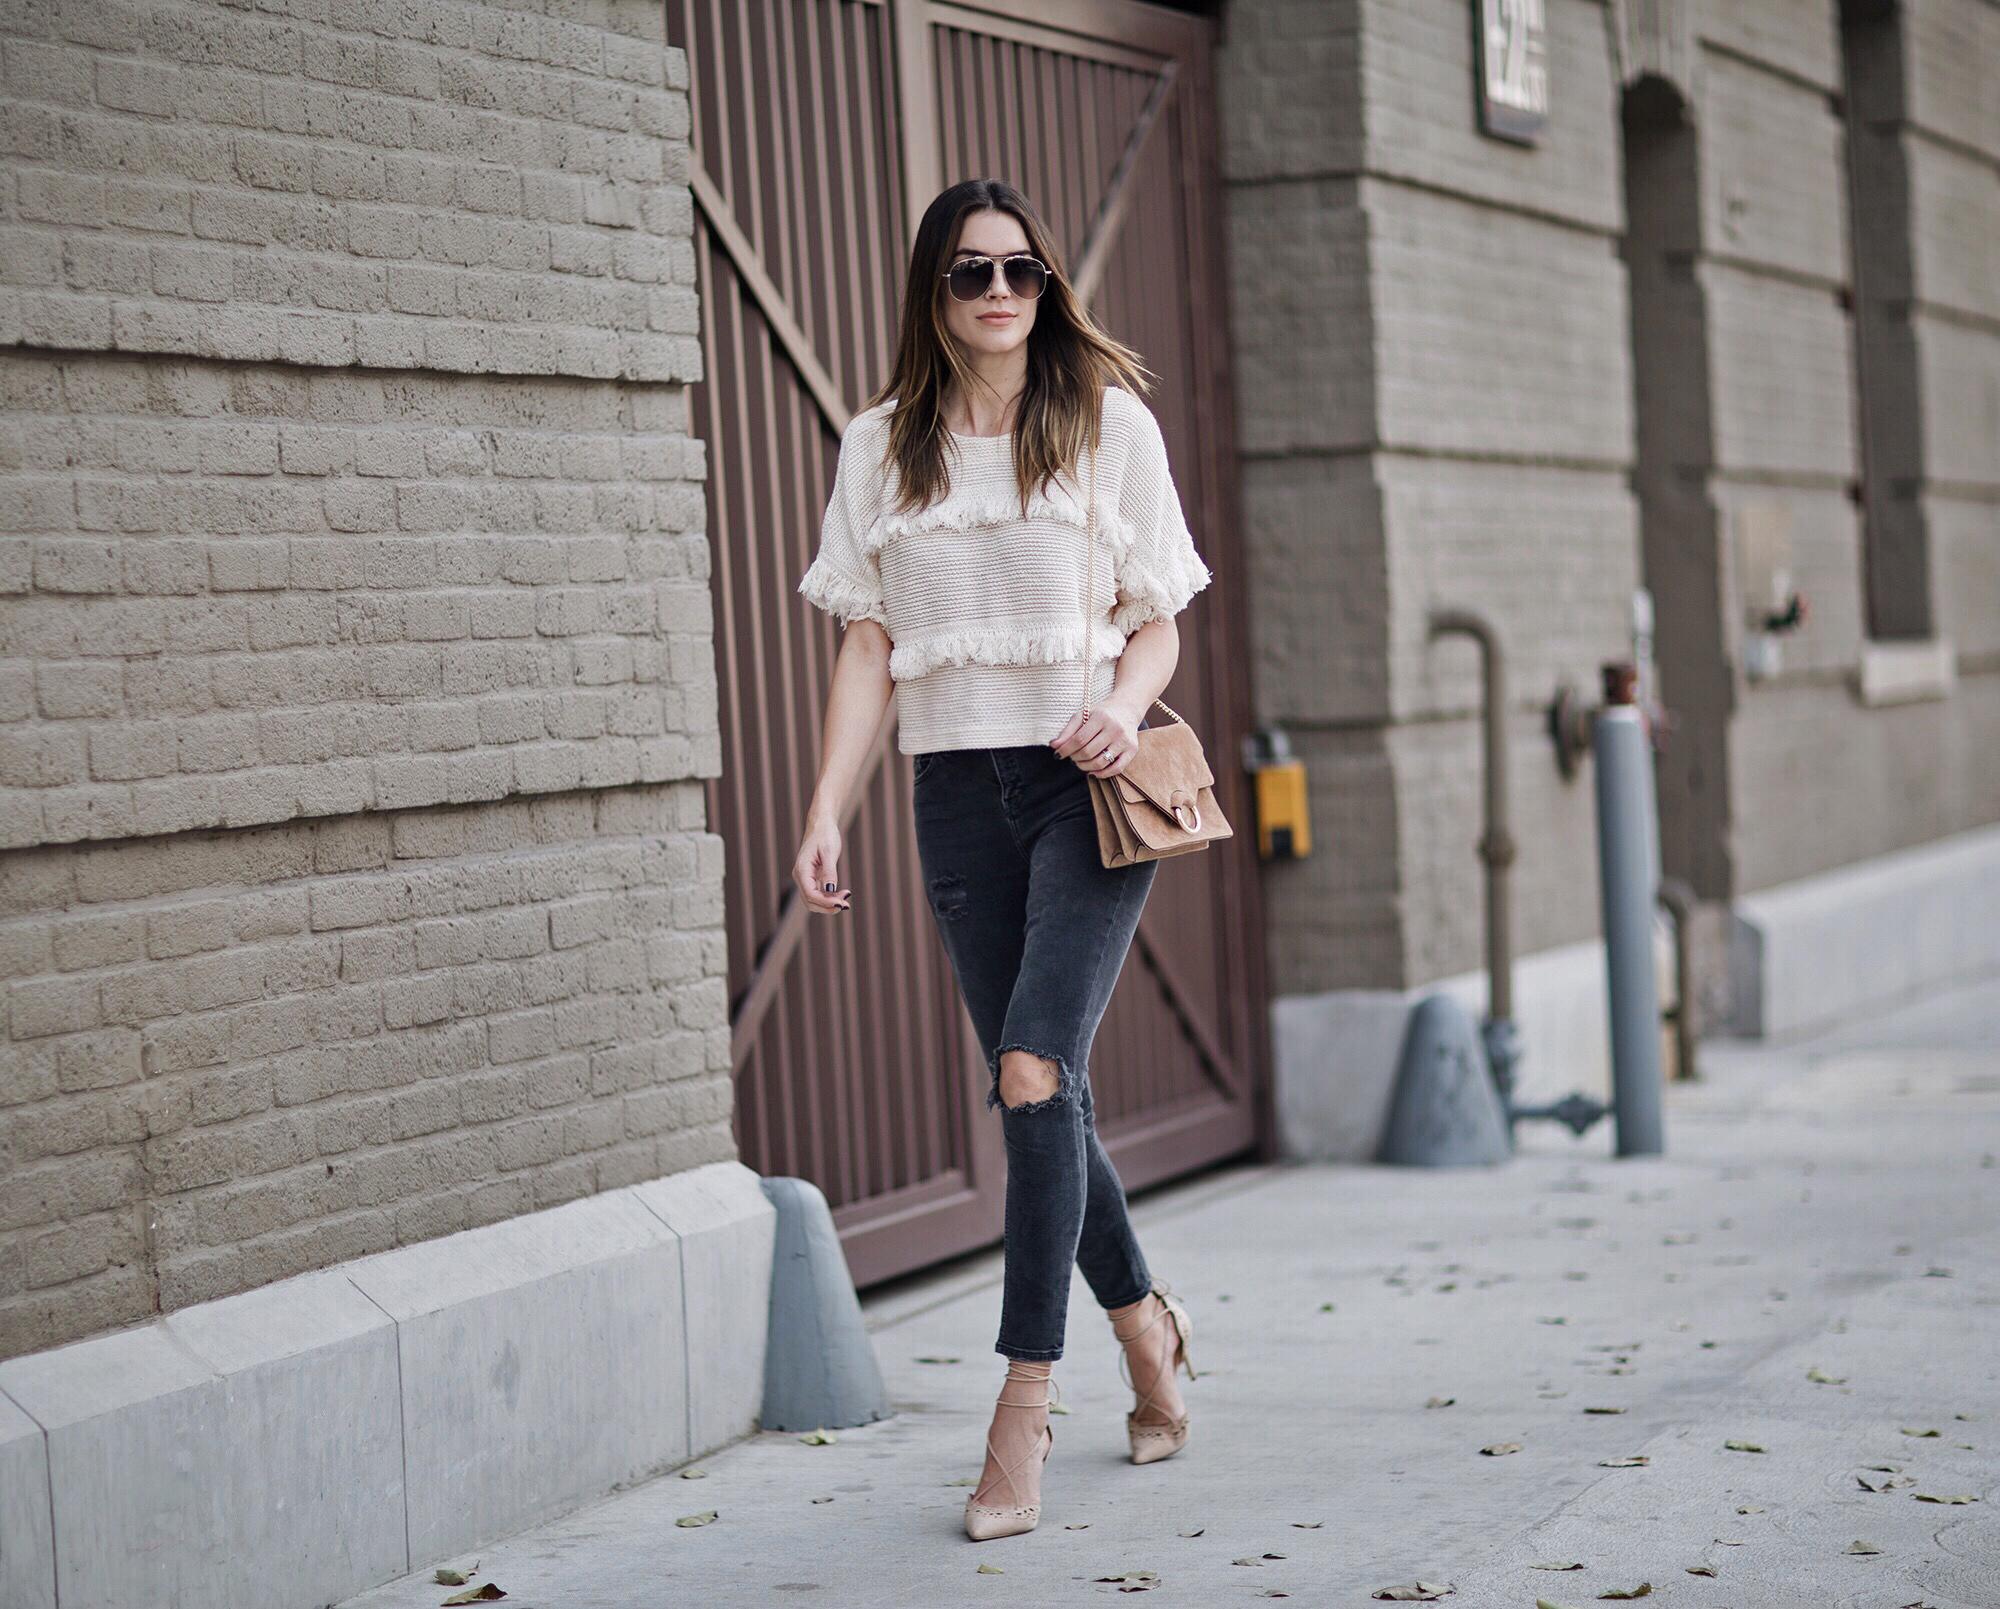 Street Style Blogger brittanyxavier.com